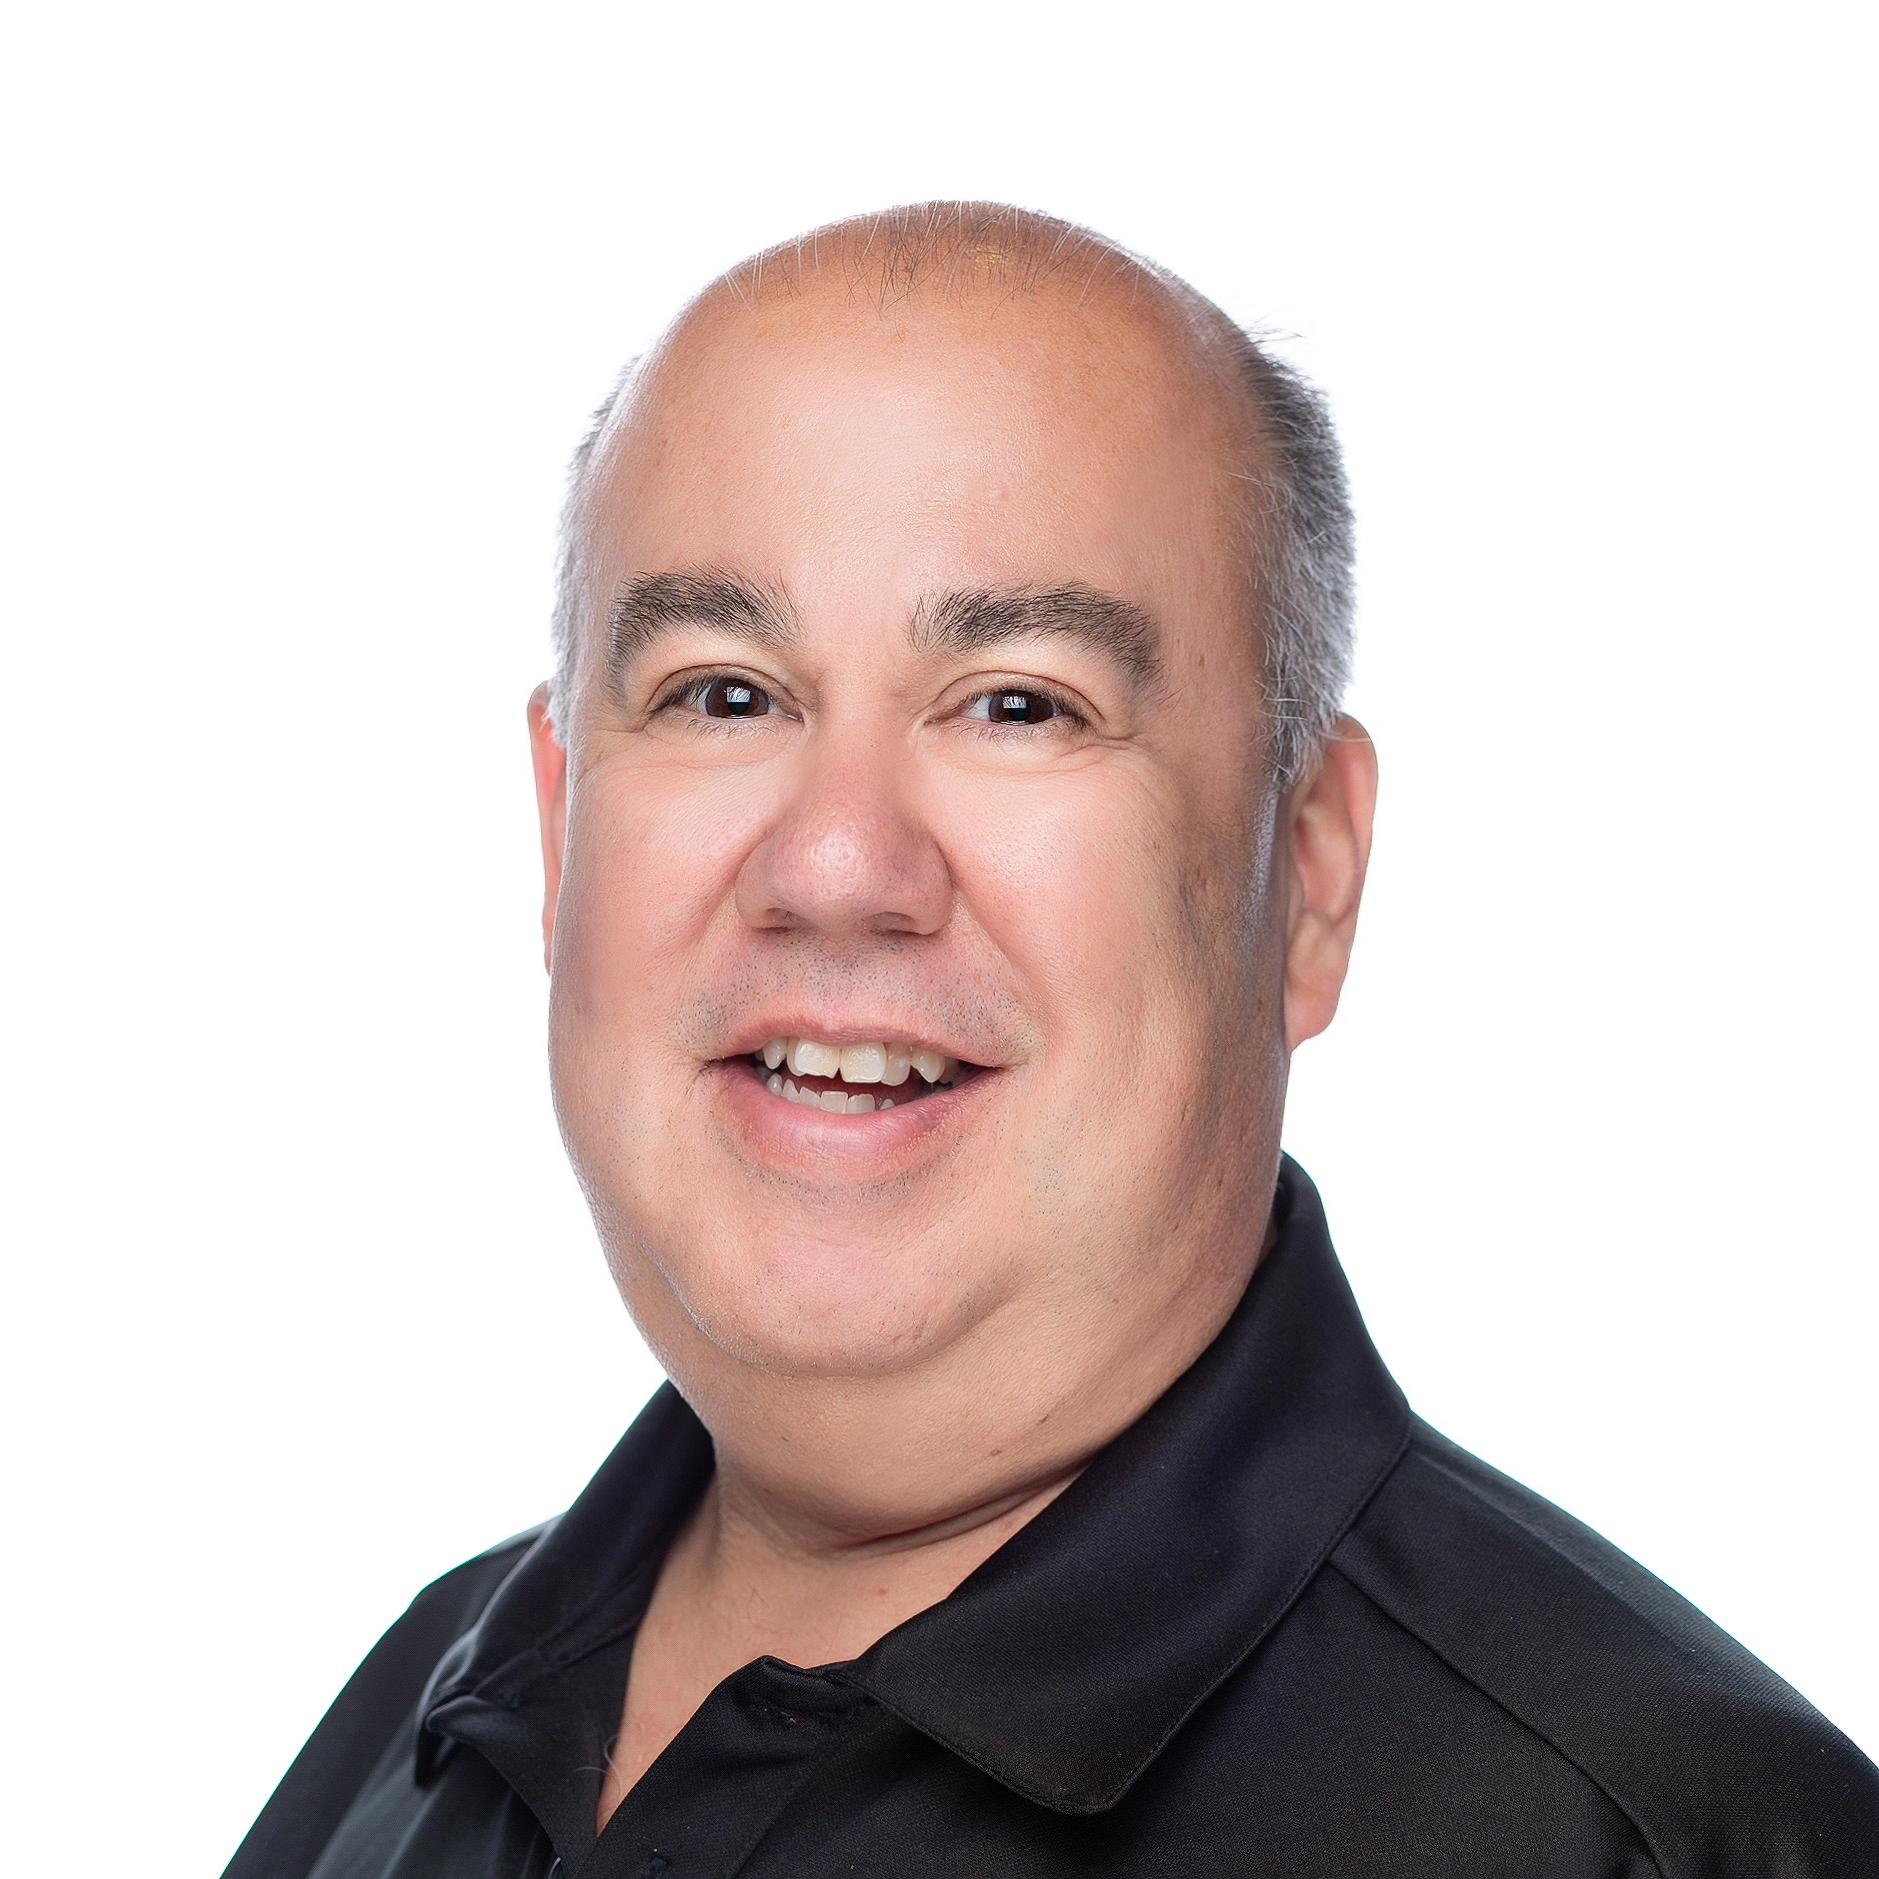 Jim Luff, Marketing Manager